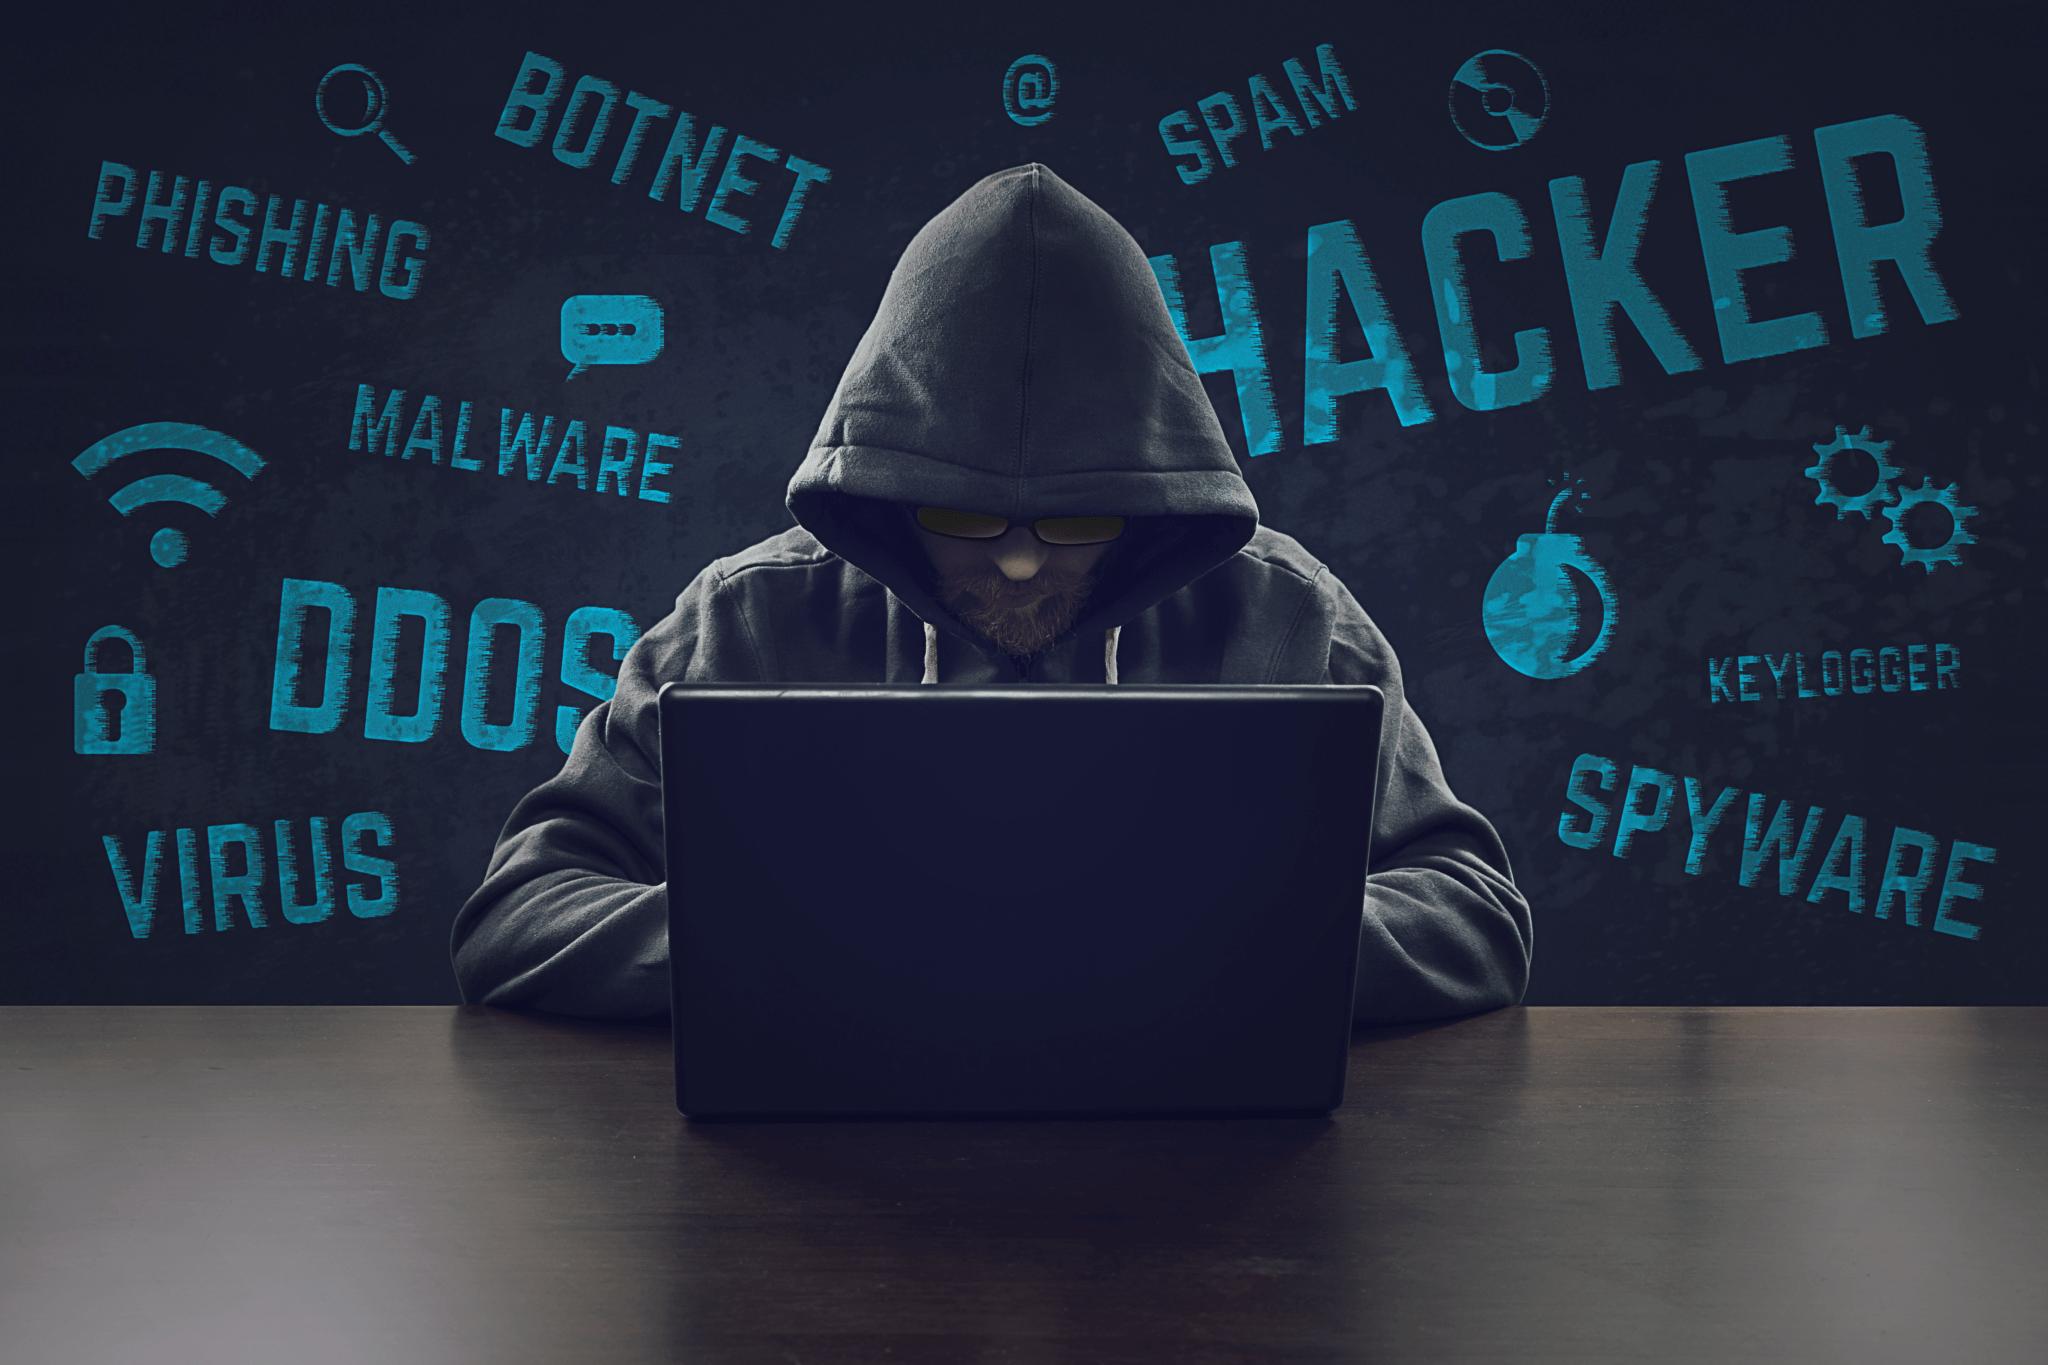 hacker using malware botnet spyware to break security